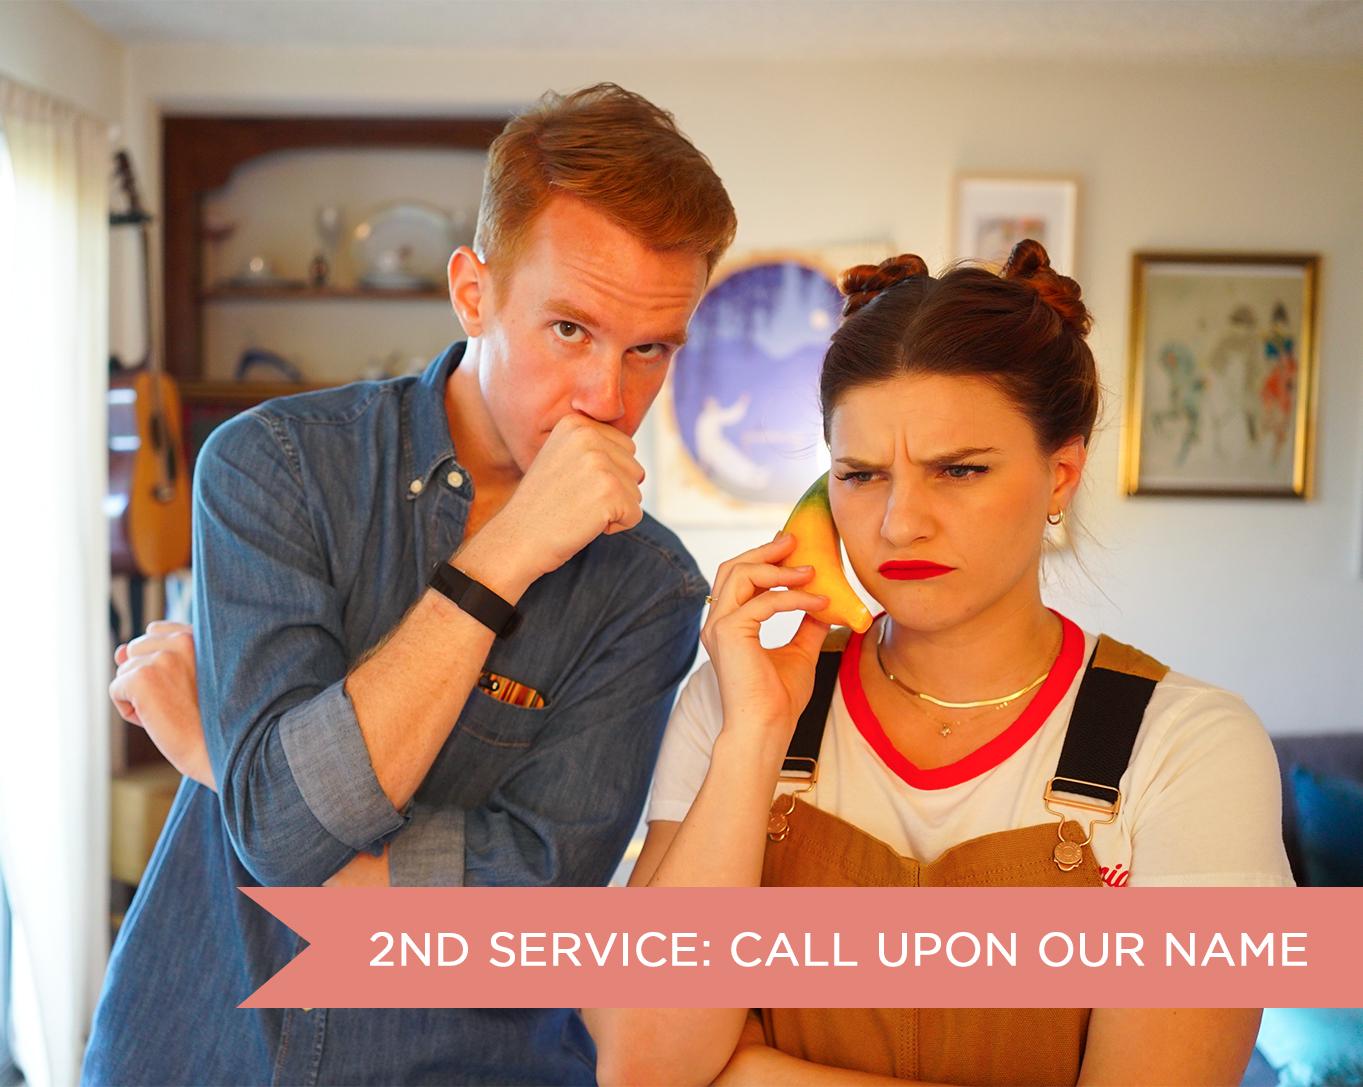 call our name.jpg